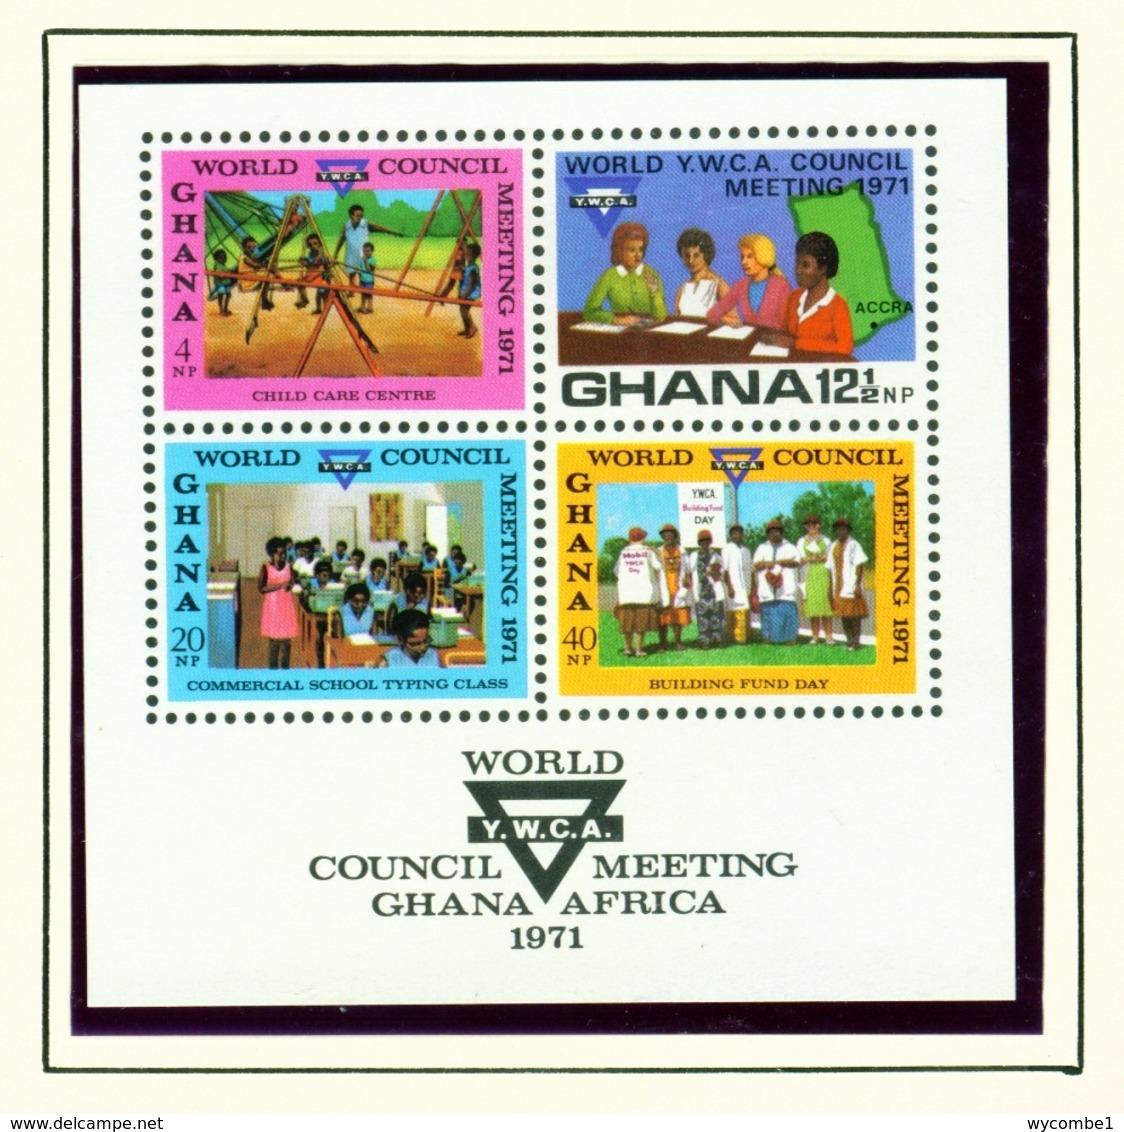 GHANA  -  1971 YWCA Miniature Sheet Unmounted/Never Hinged Mint - Ghana (1957-...)